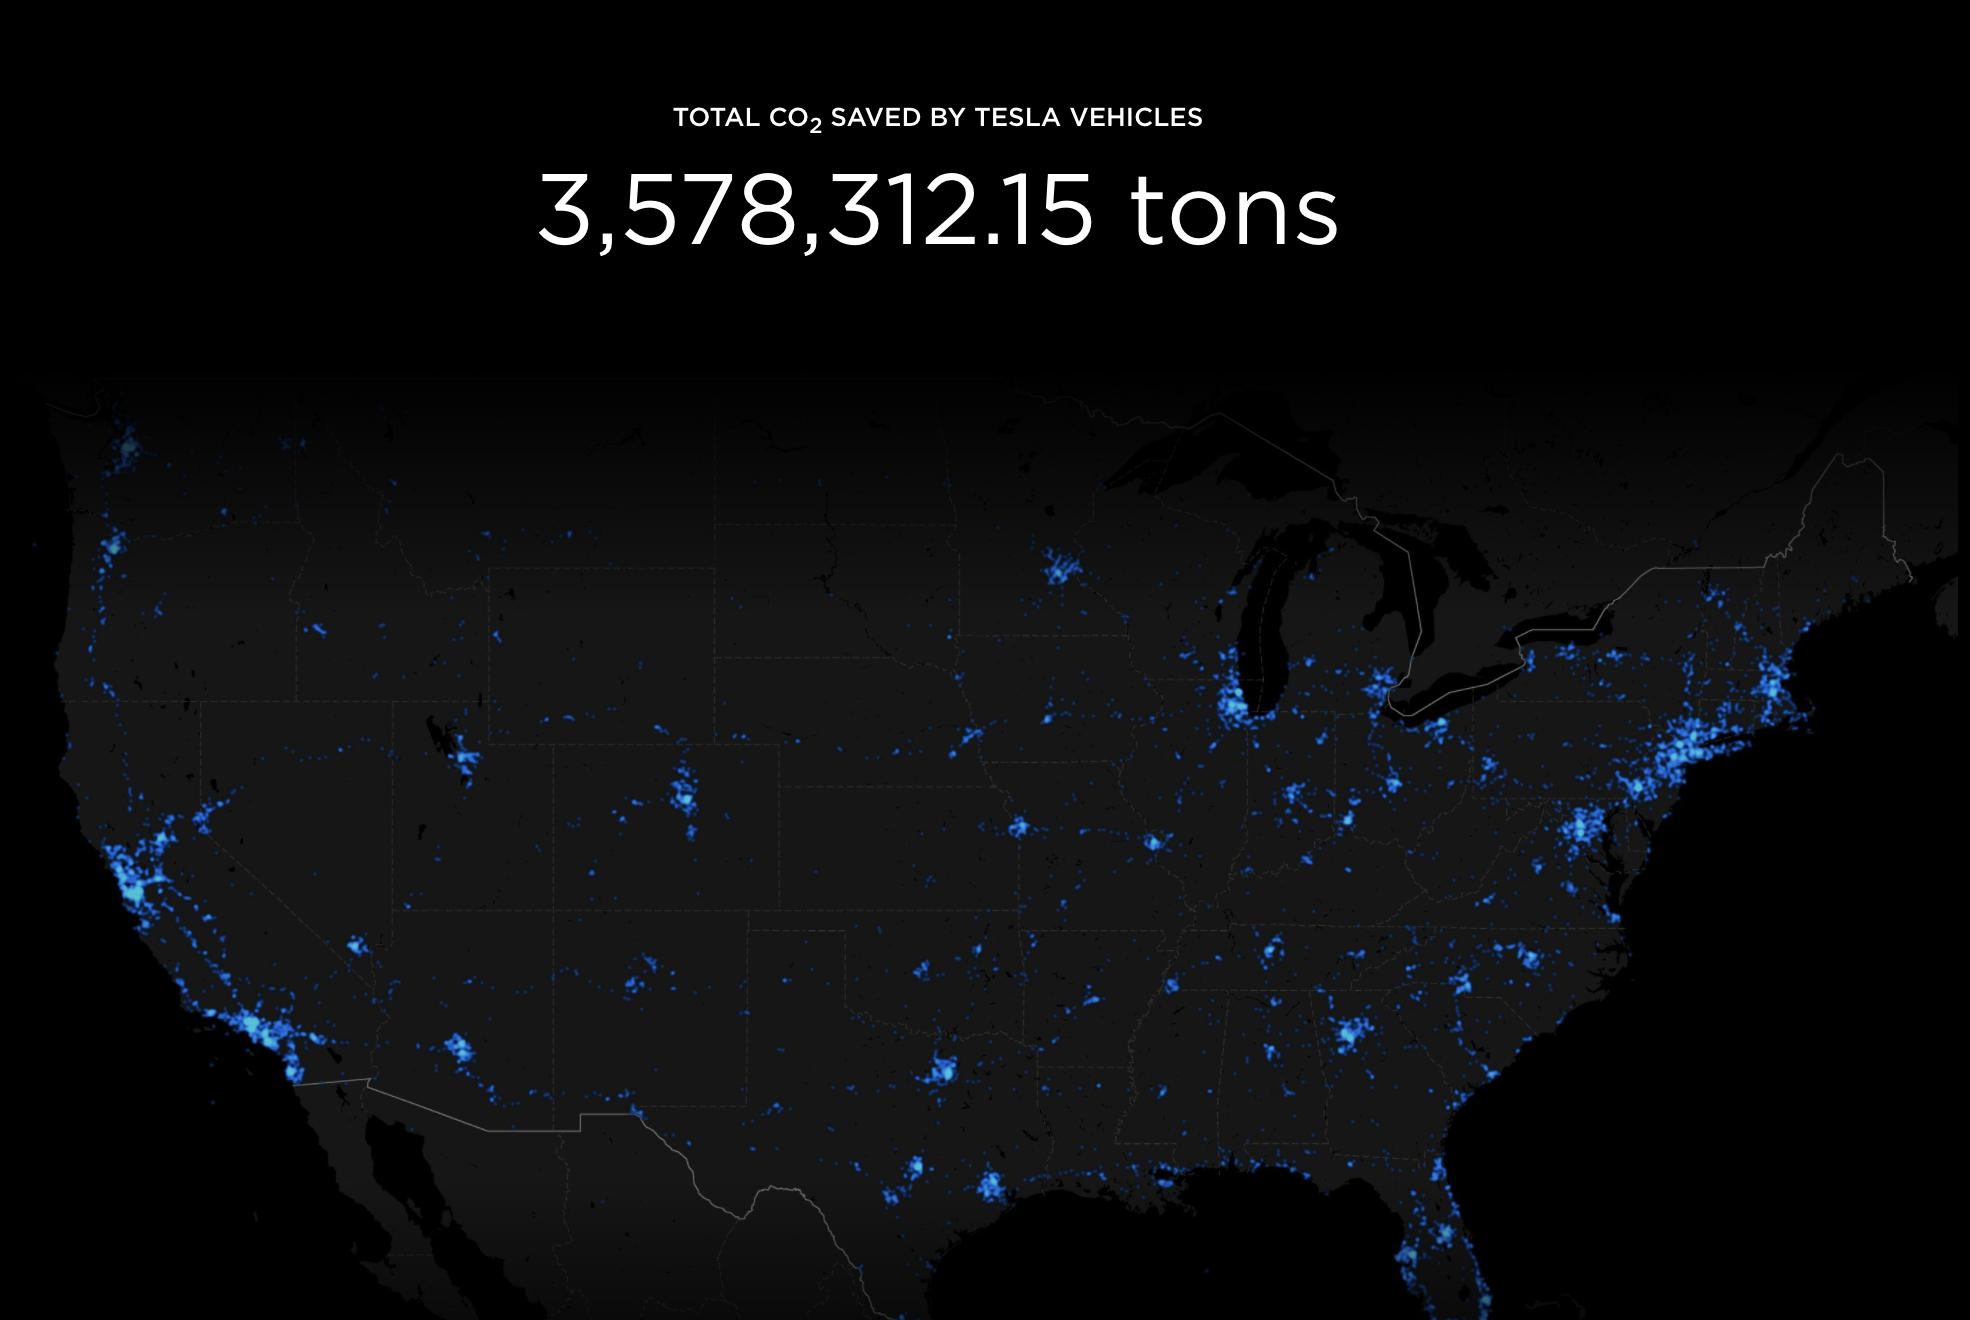 Tesla carbon impact